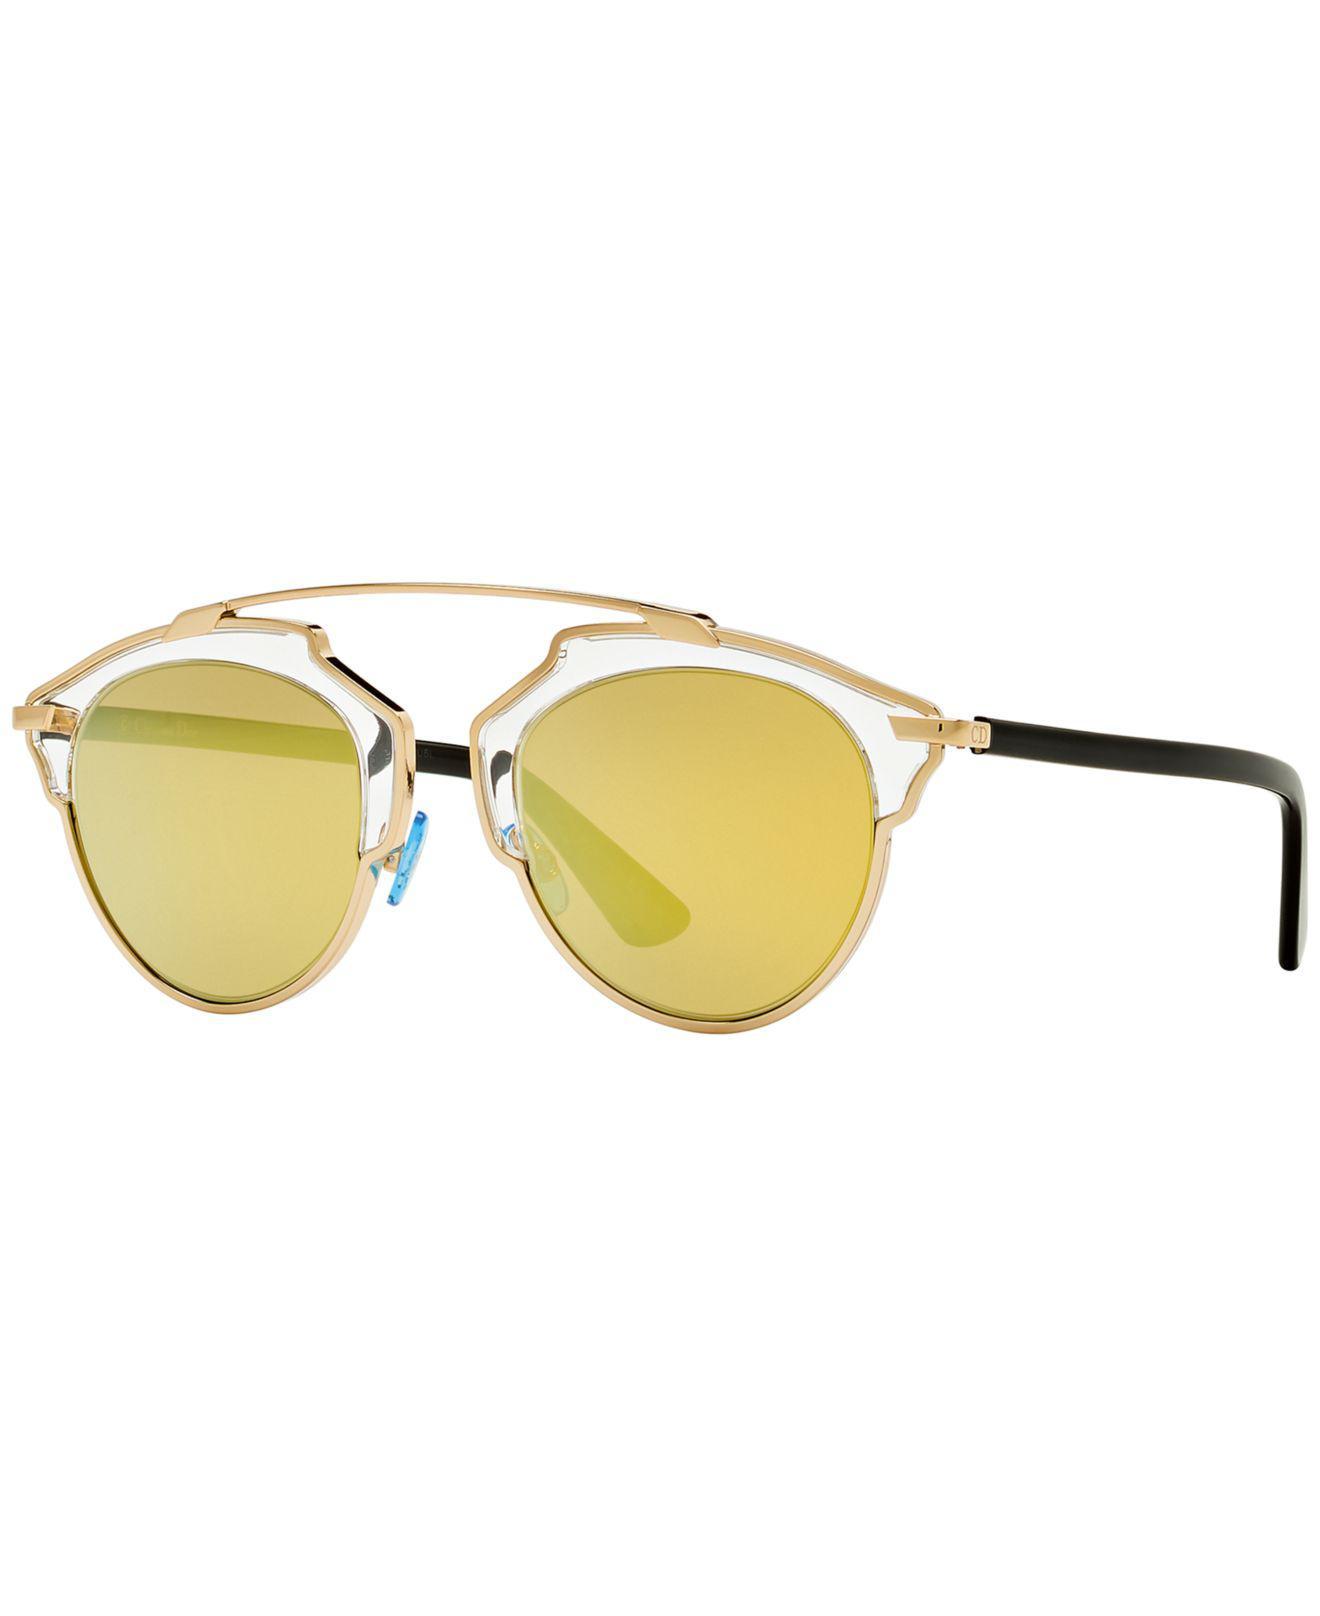 265681073995 Dior. Women s Metallic Sunglasses